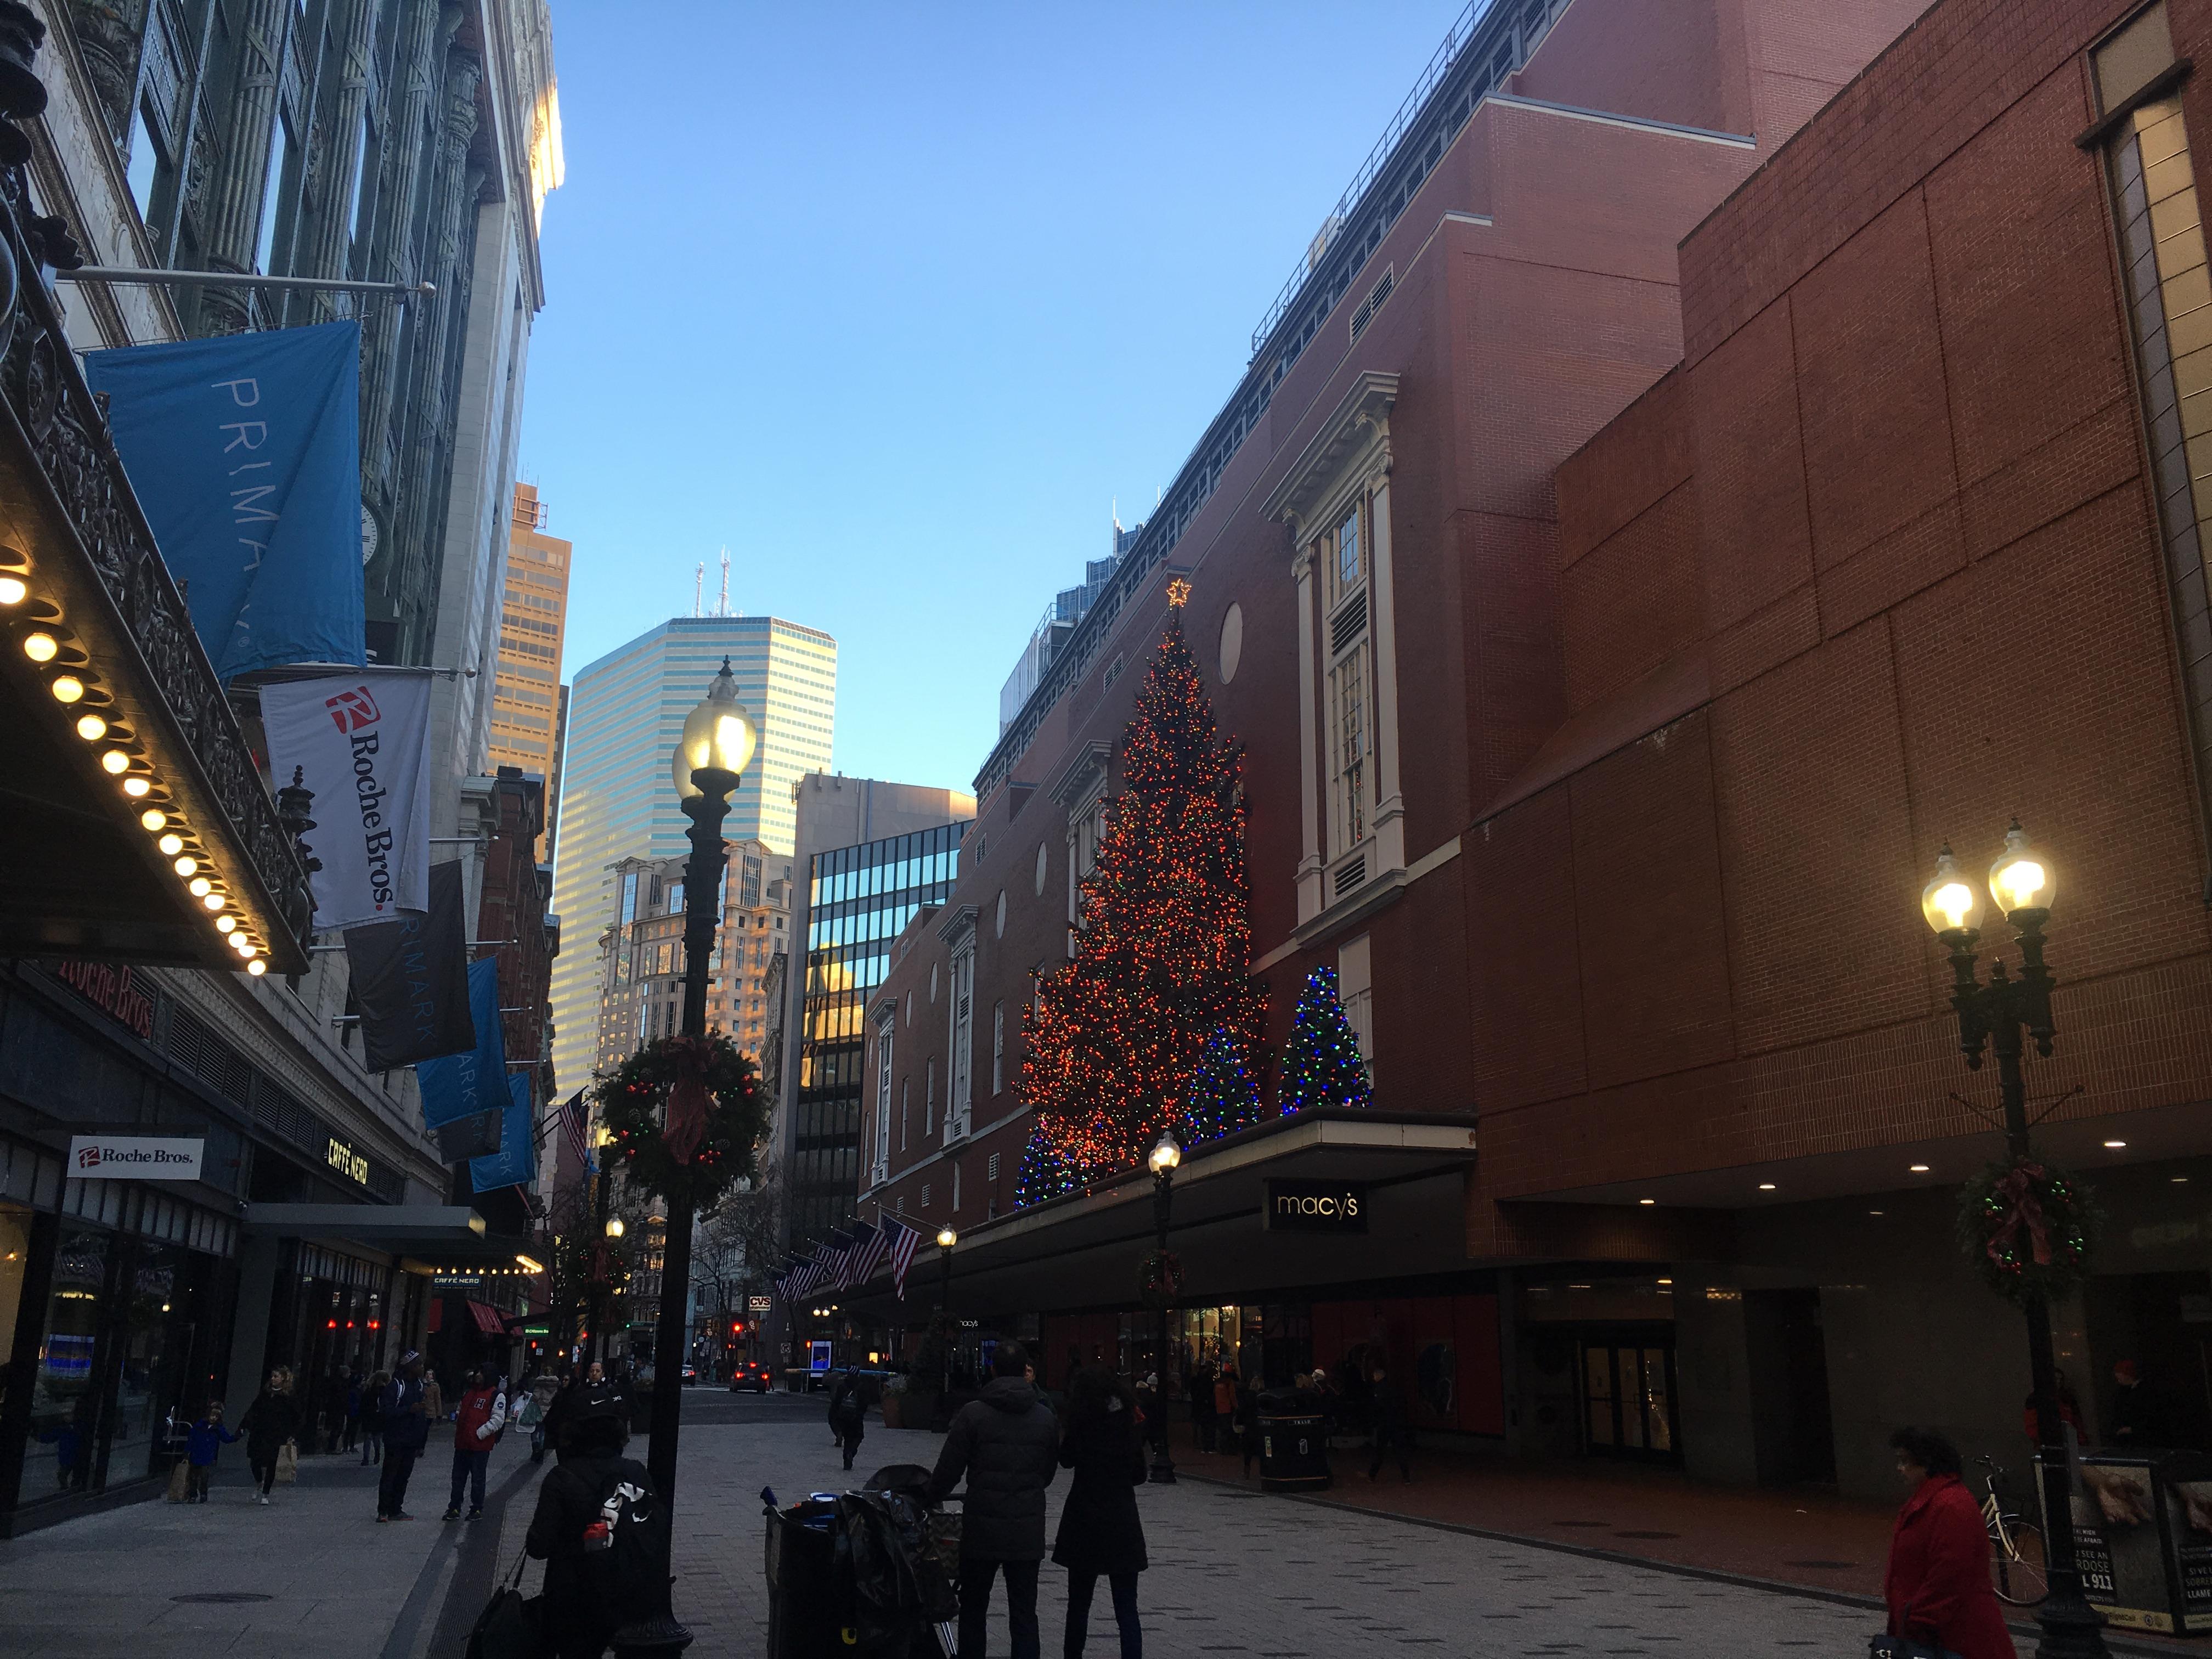 boston met kerst